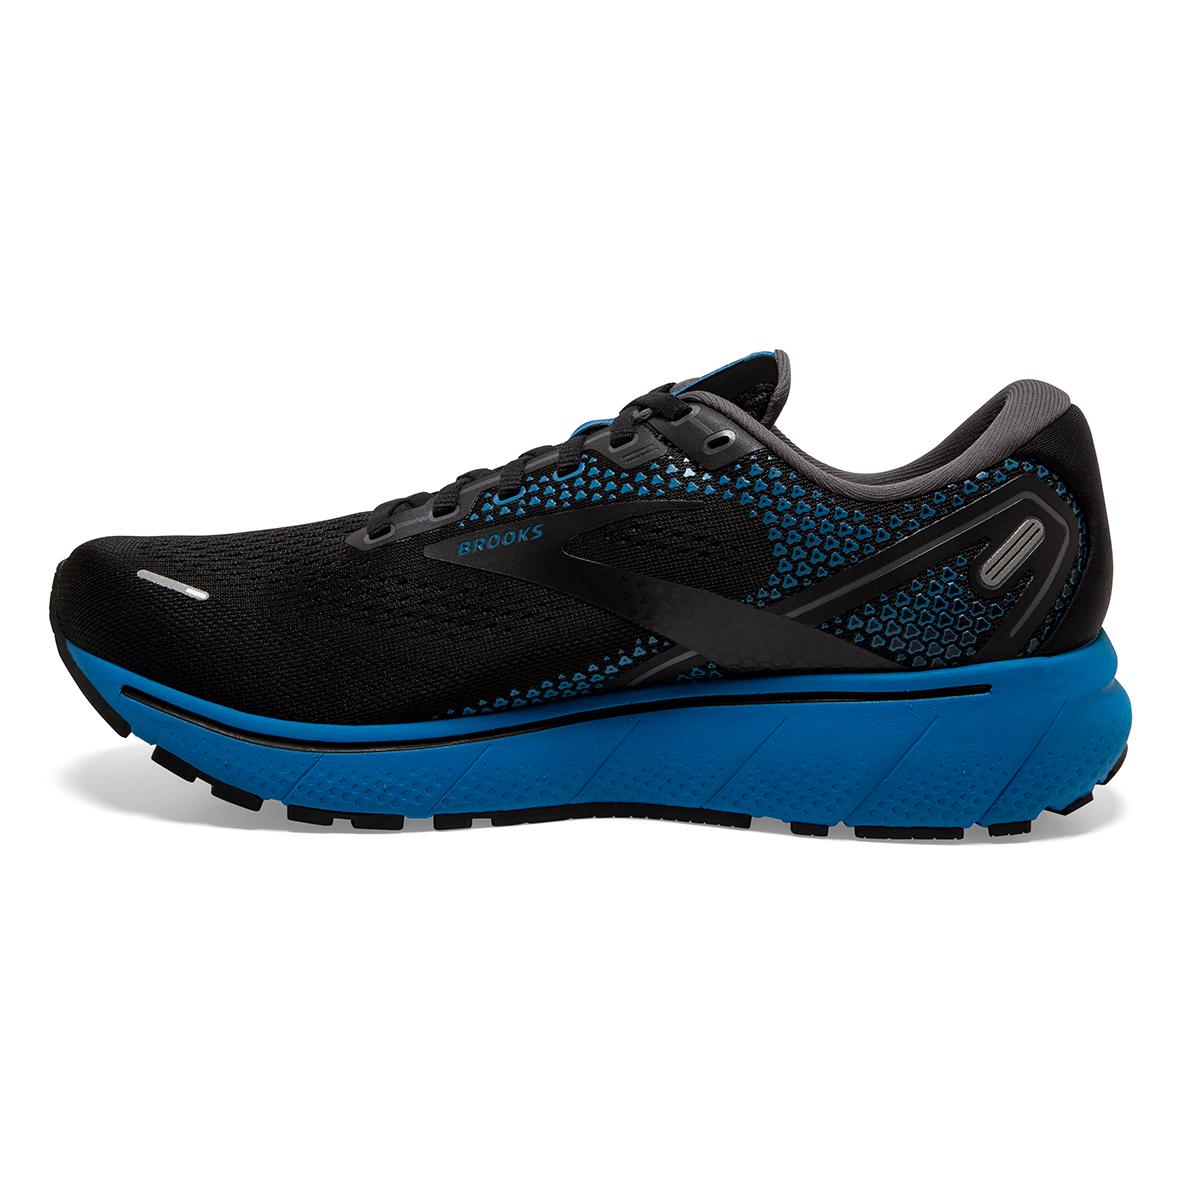 Men's Brooks Ghost 14 Running Shoe - Color: Black/Blackened - Size: 7 - Width: Regular, Black/Blackened, large, image 2